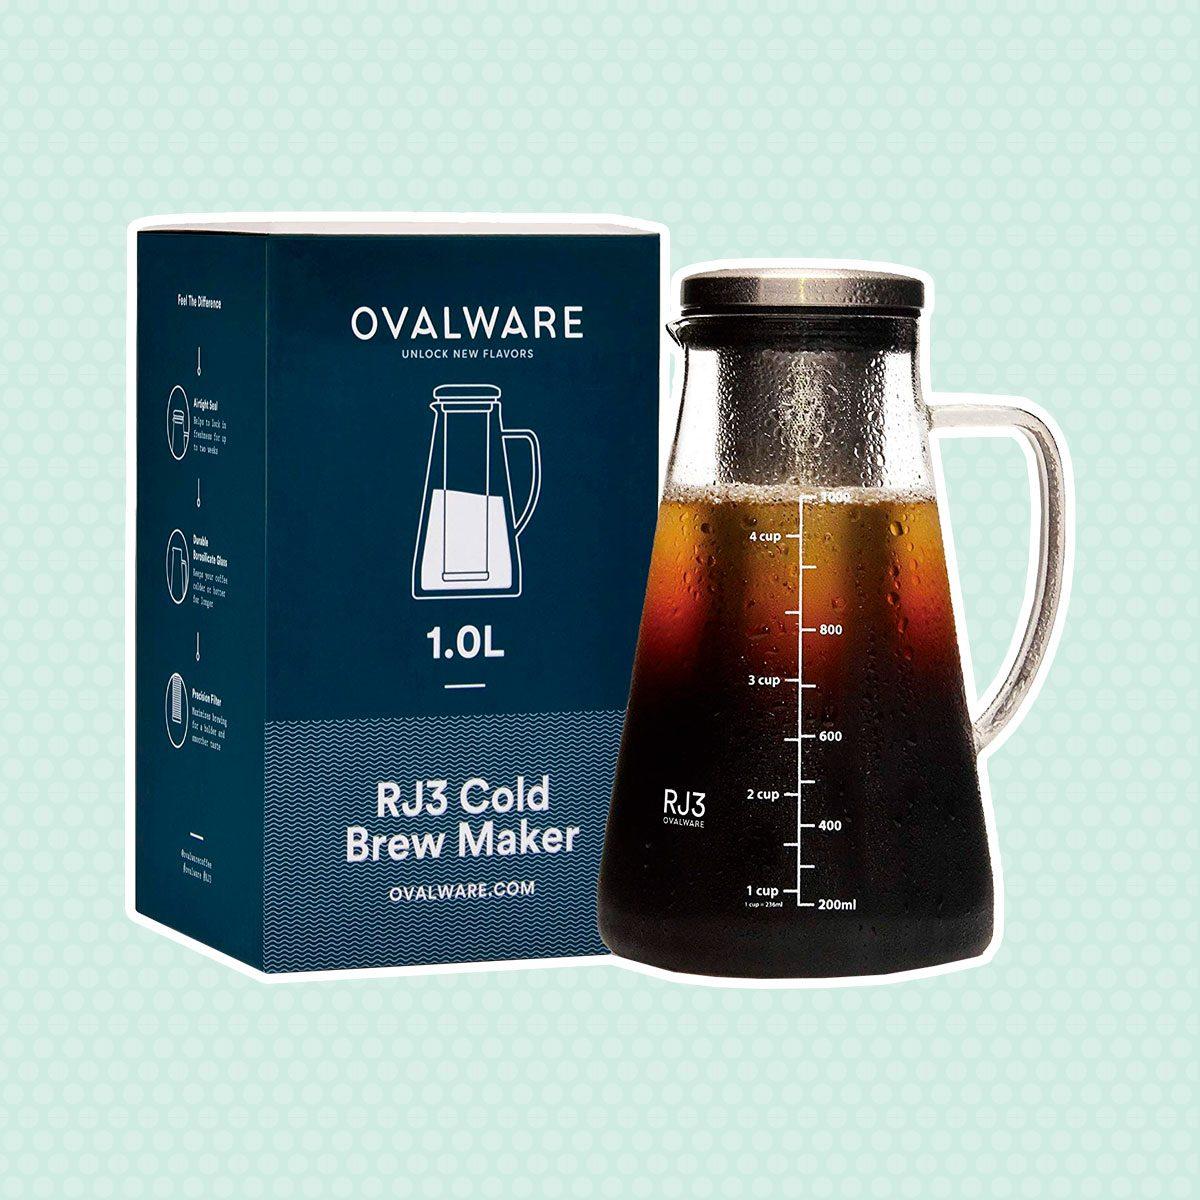 Ovalware RJ3 Cold Brew Maker